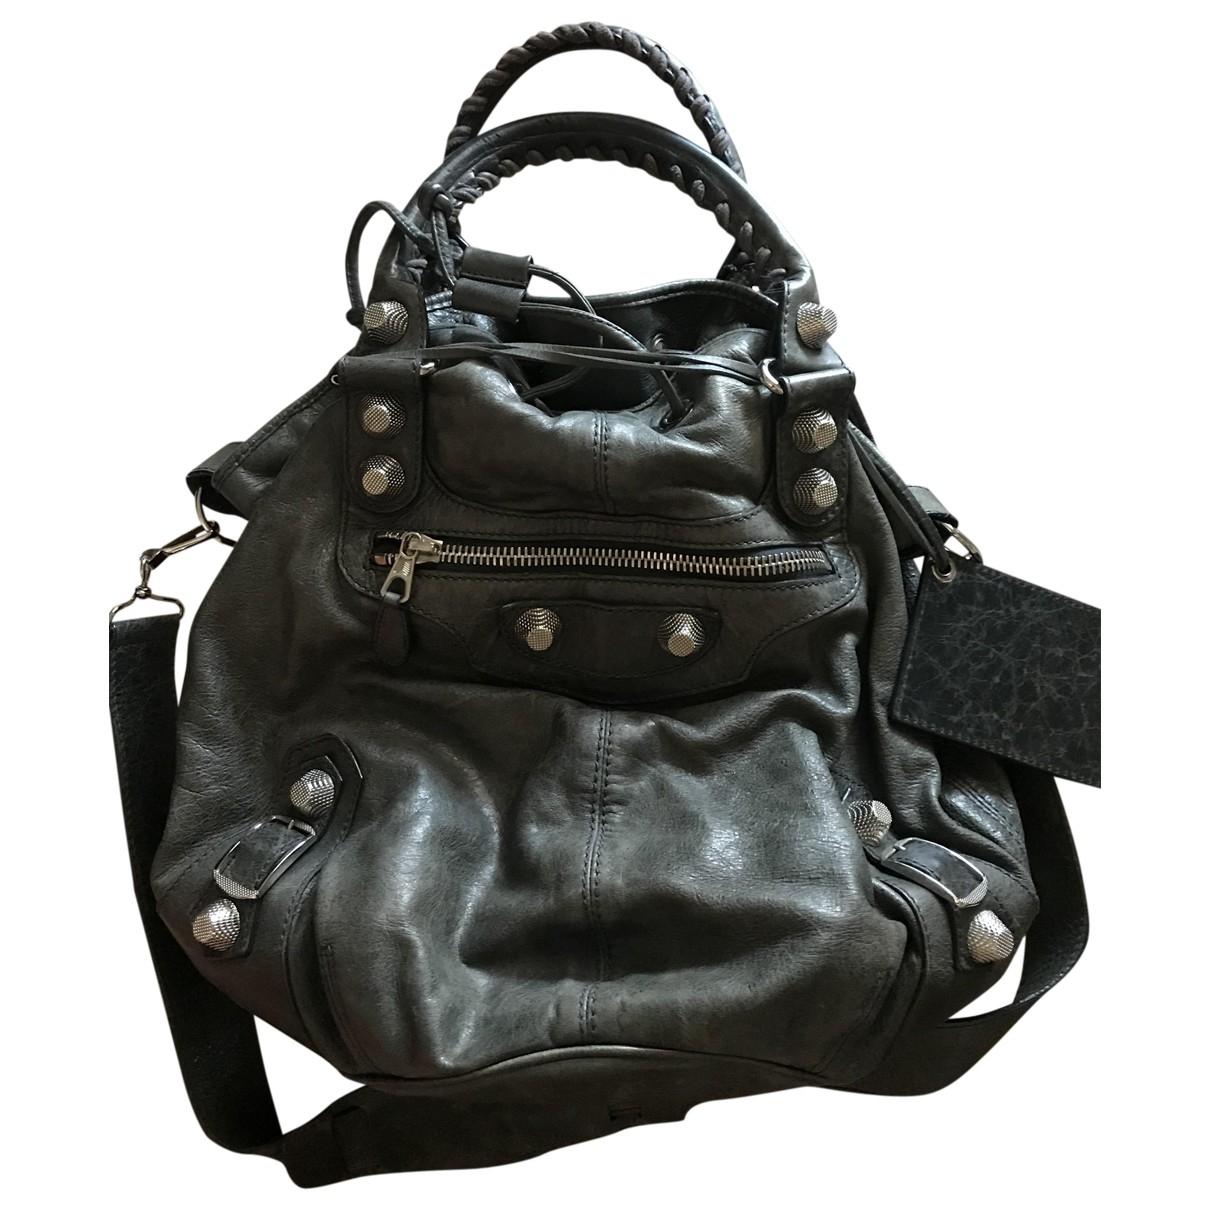 Balenciaga Pompon Handtasche in  Grau Leder